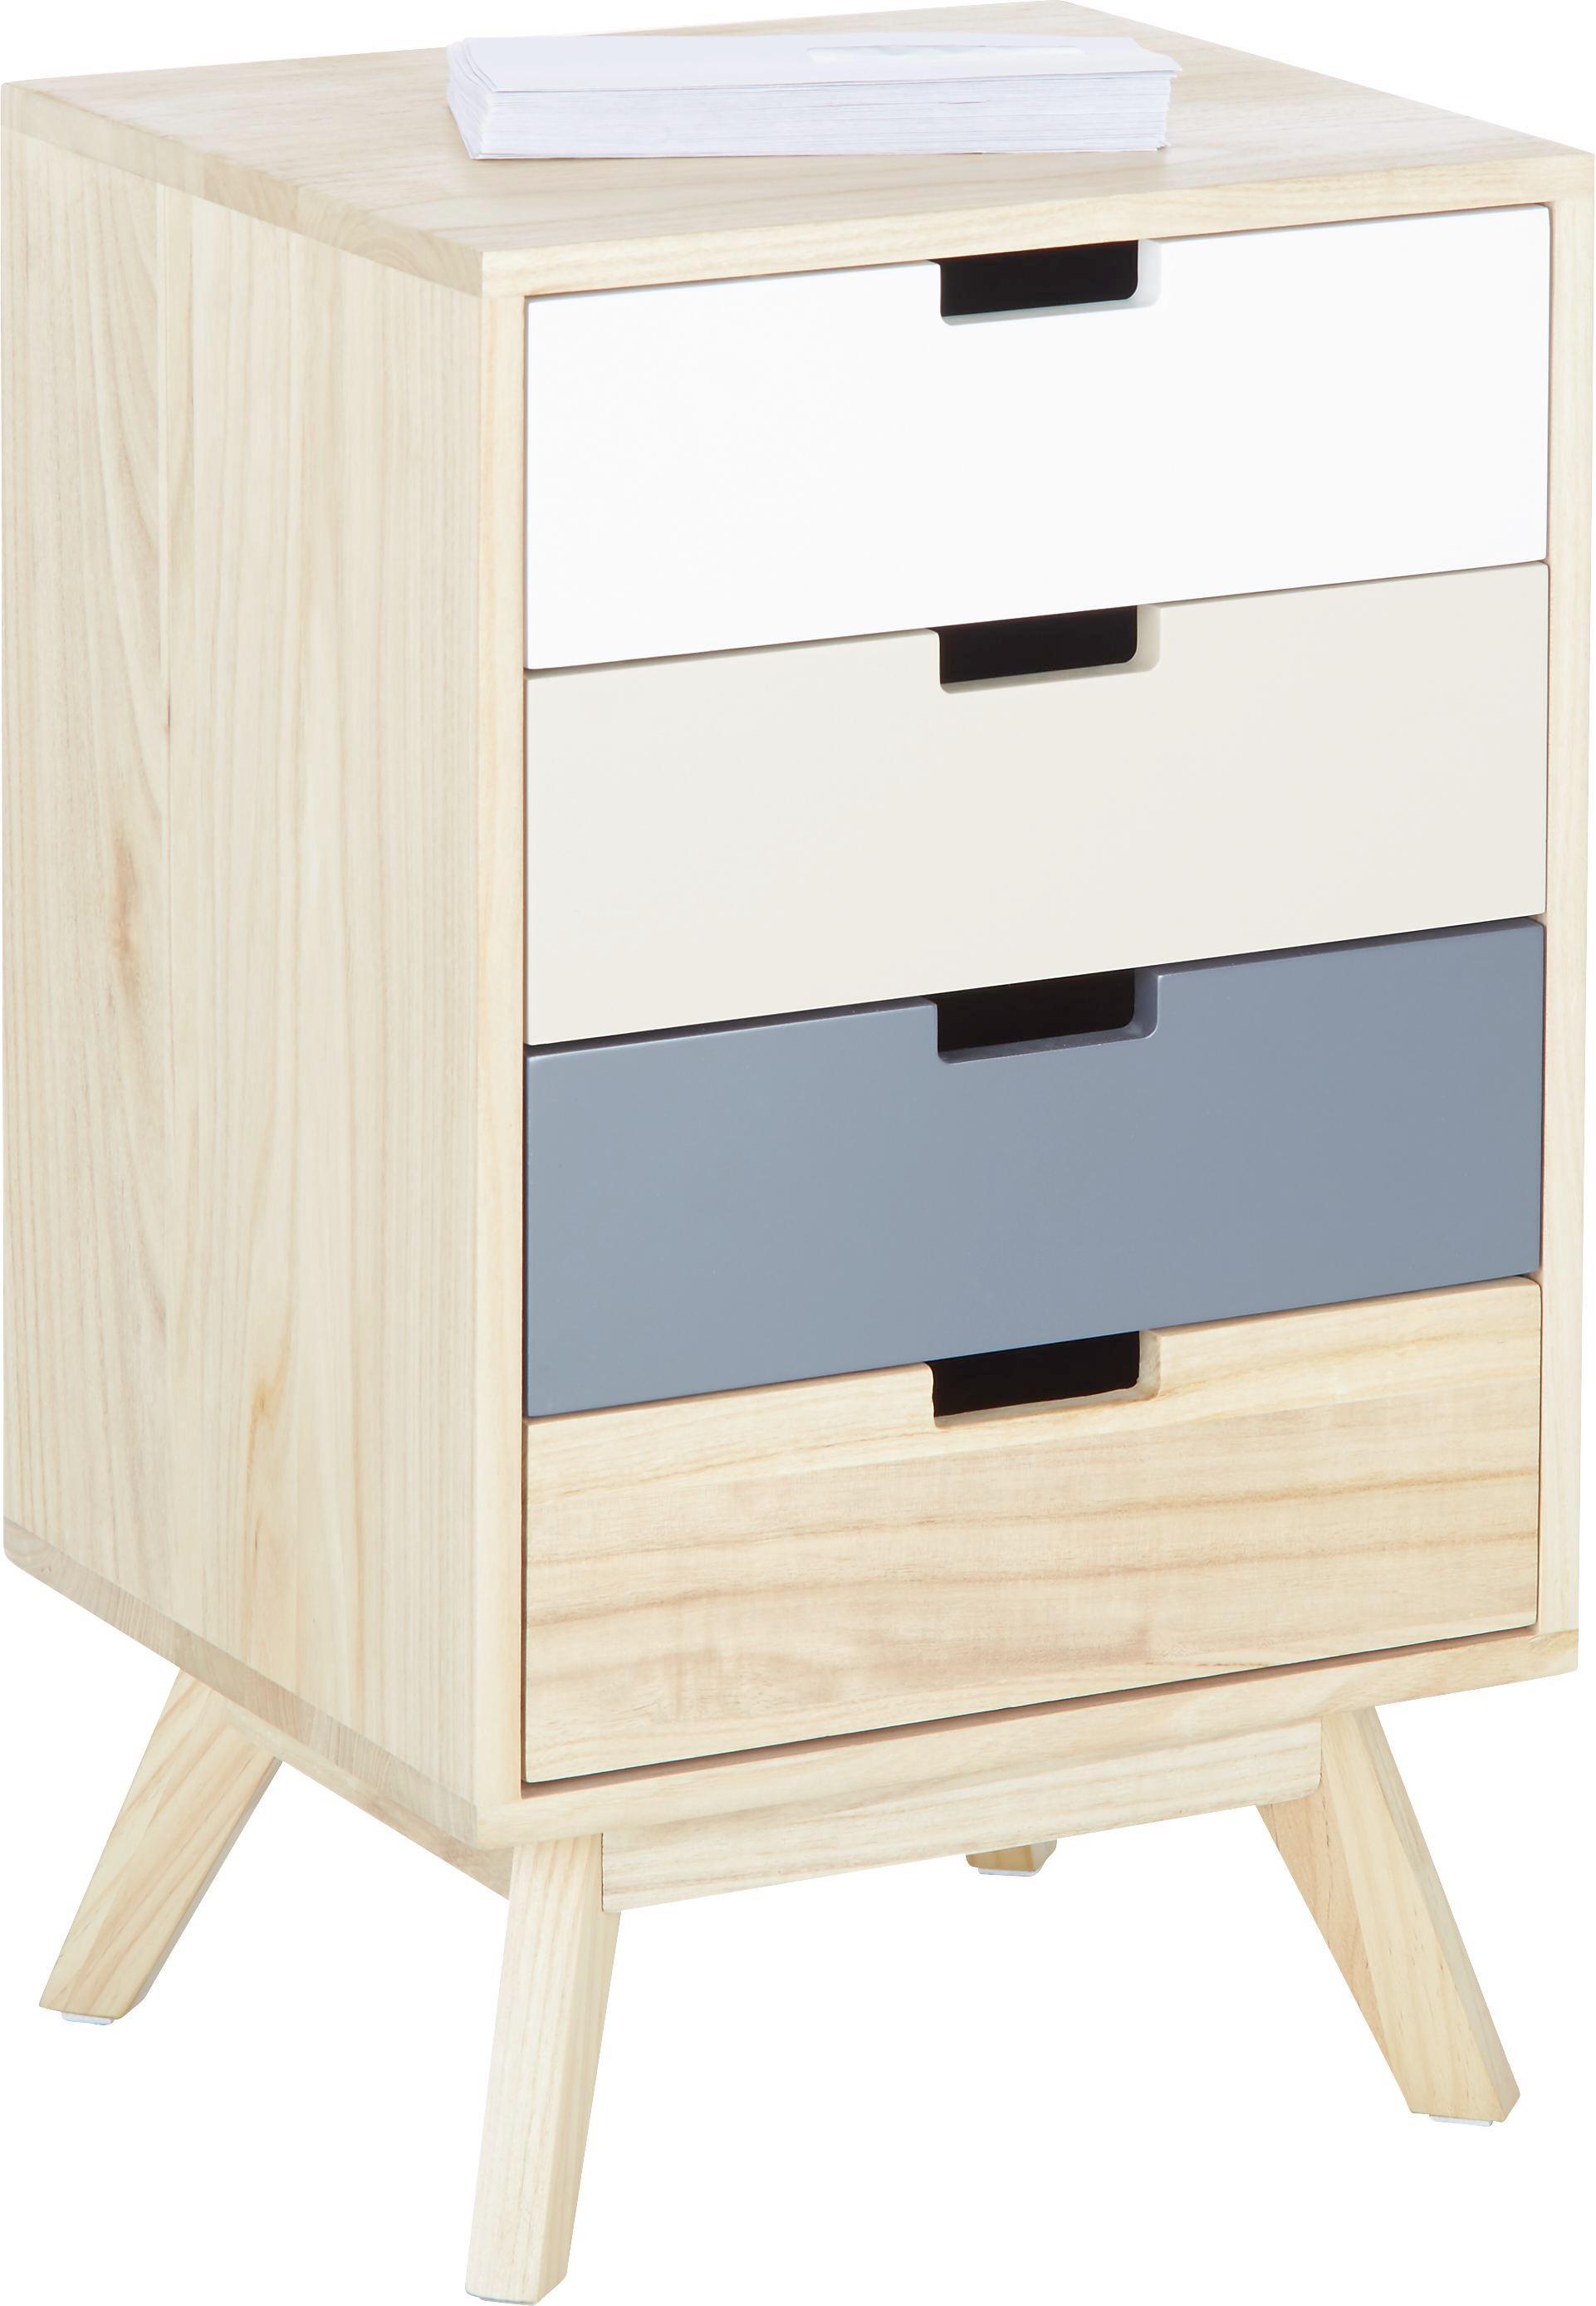 Kommode aus Echtholz - Creme/Naturfarben, Holz/Holzwerkstoff (40/65,5/36cm) - MÖMAX modern living